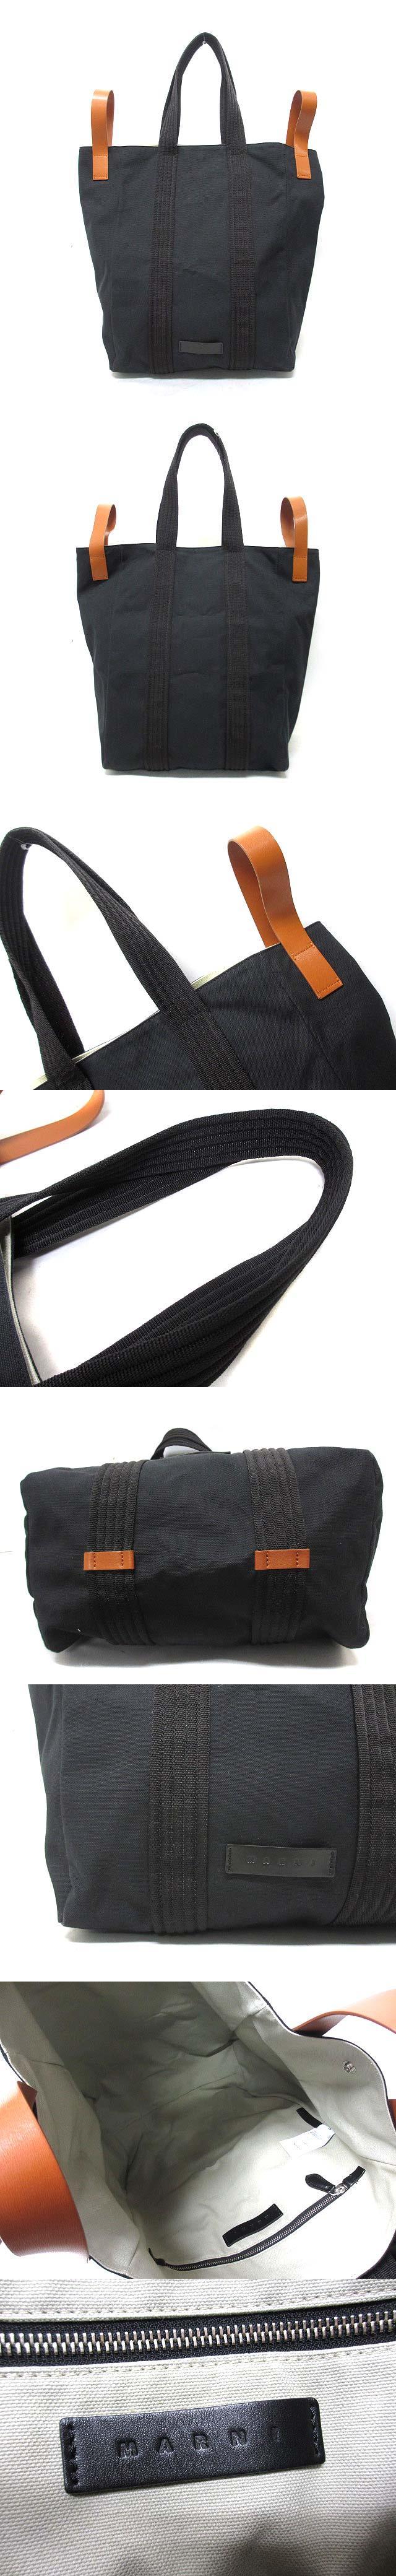 18SS キャンバス トート ショッピング バッグ 黒 ブラック SHMQWWC032487030322S